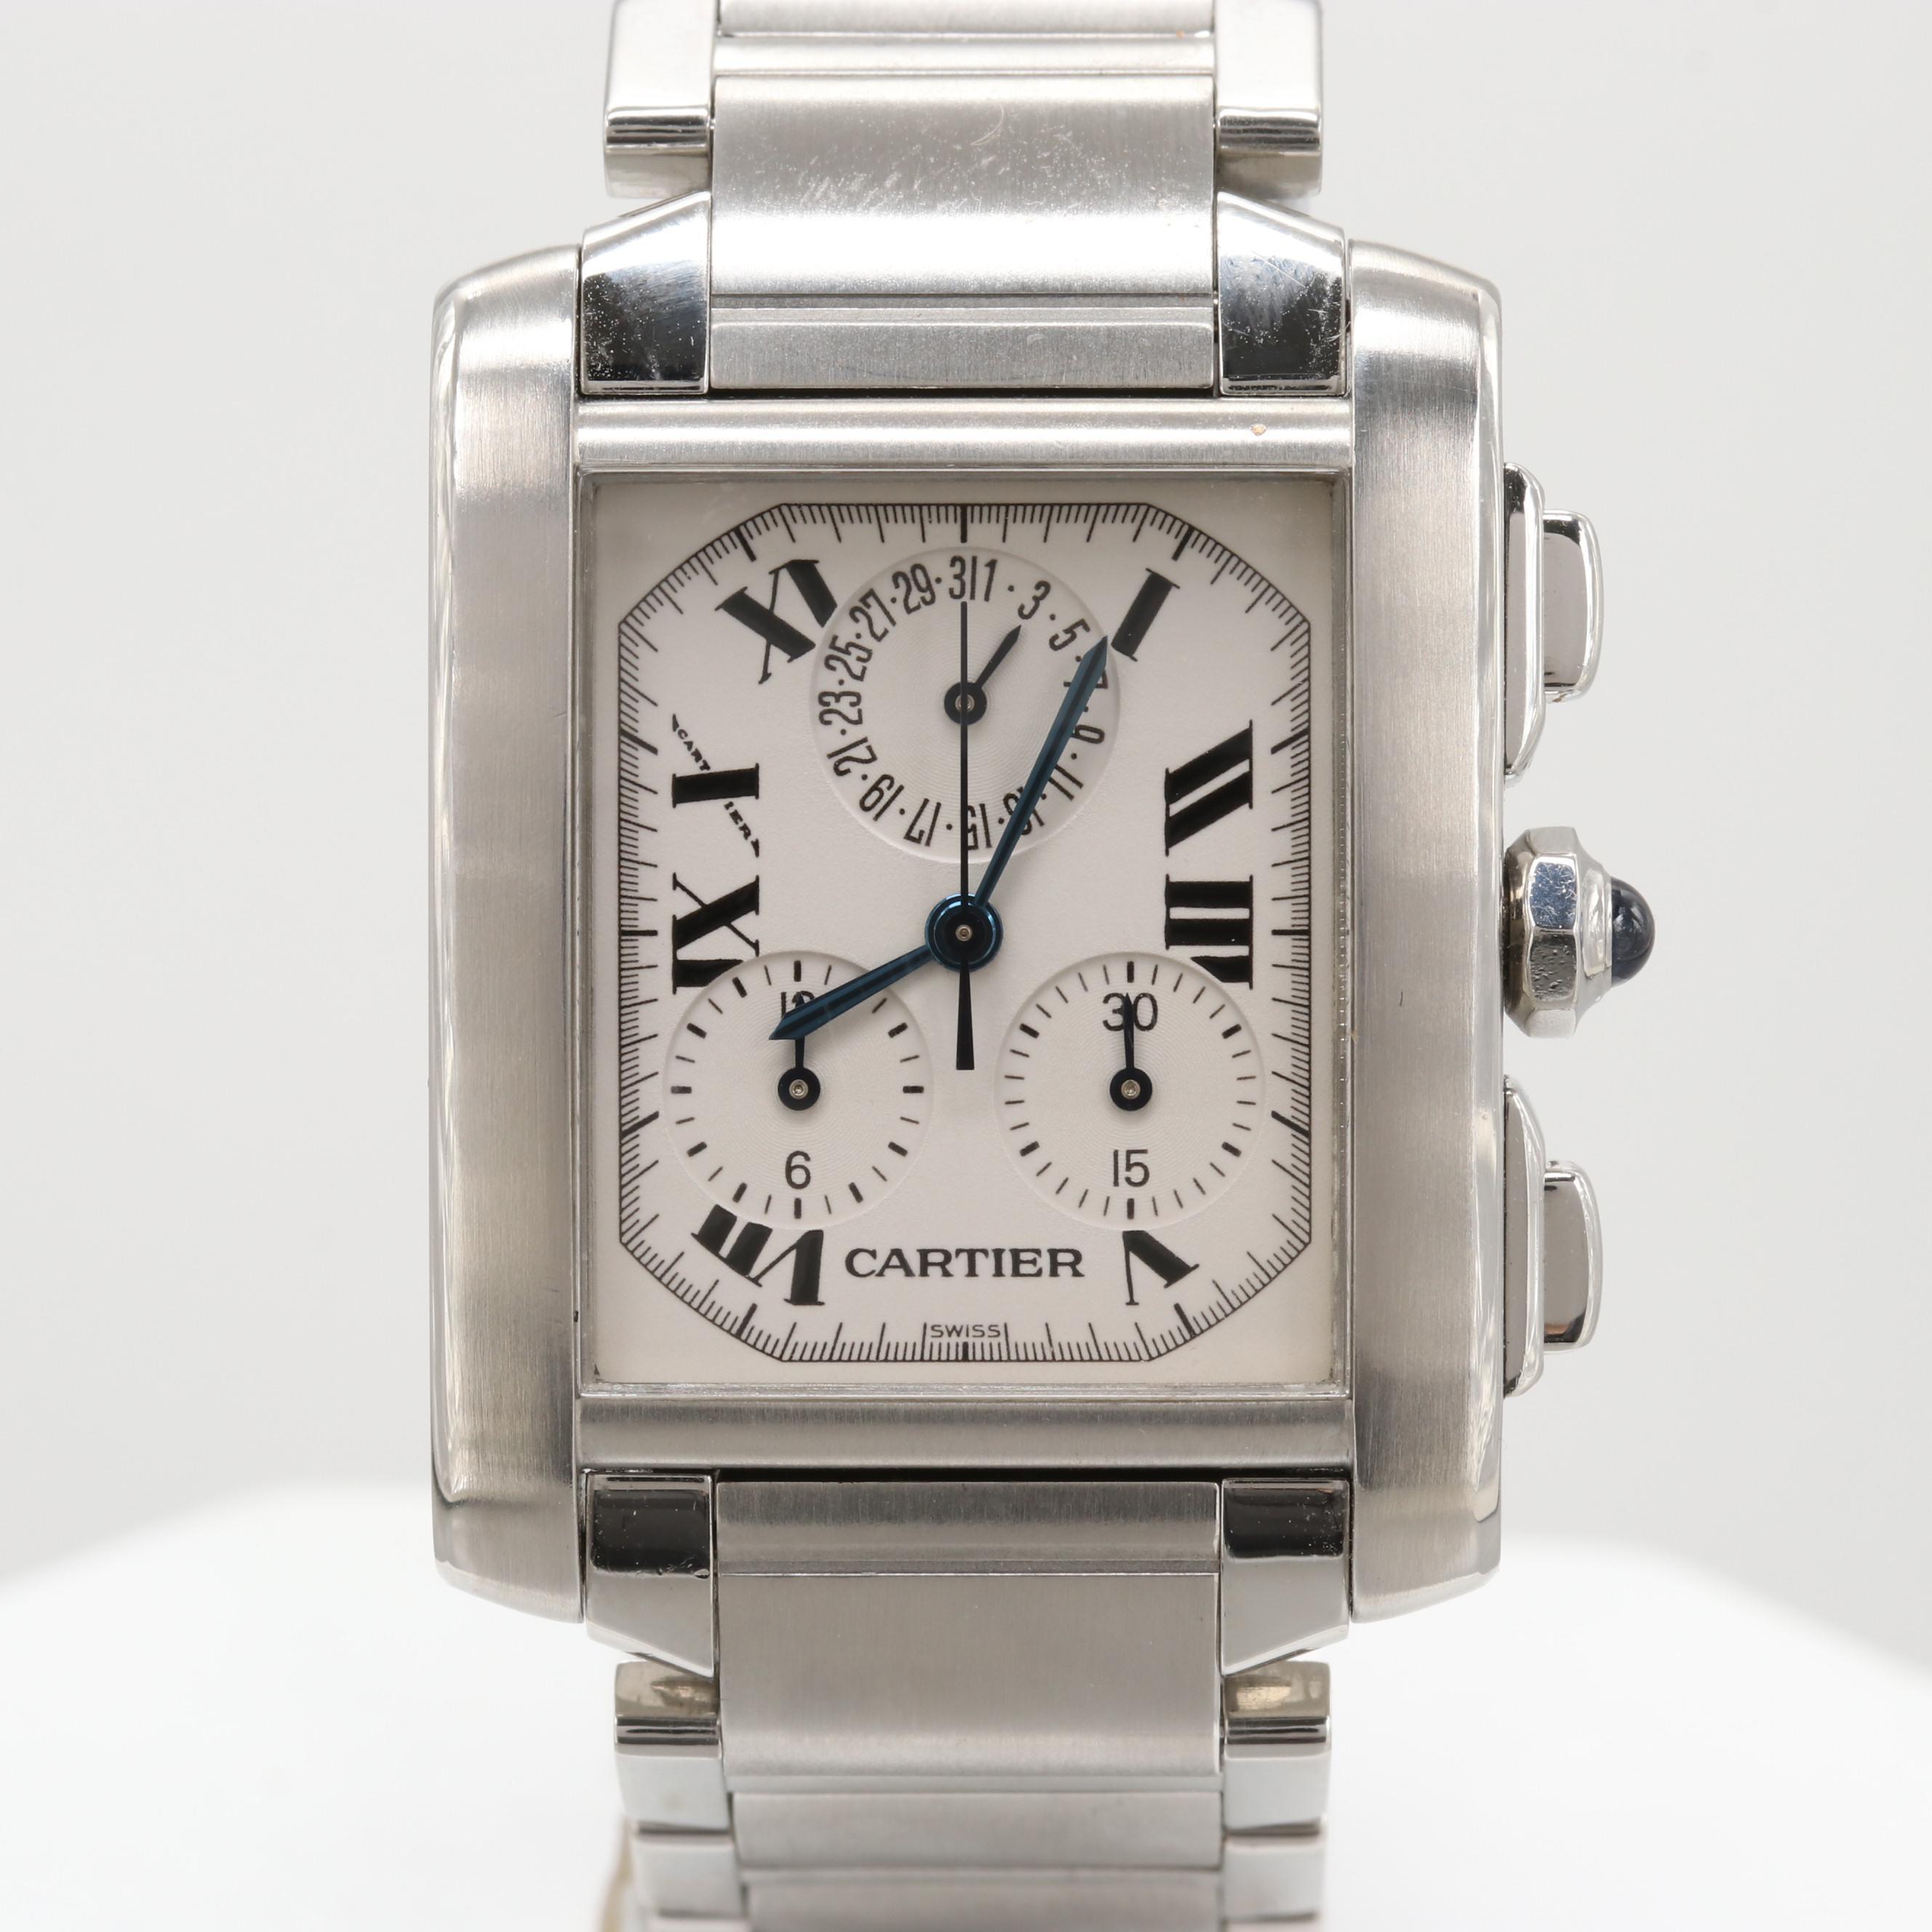 Cartier Tank Francaise Chronoflex Quartz Chronograph Wristwatch